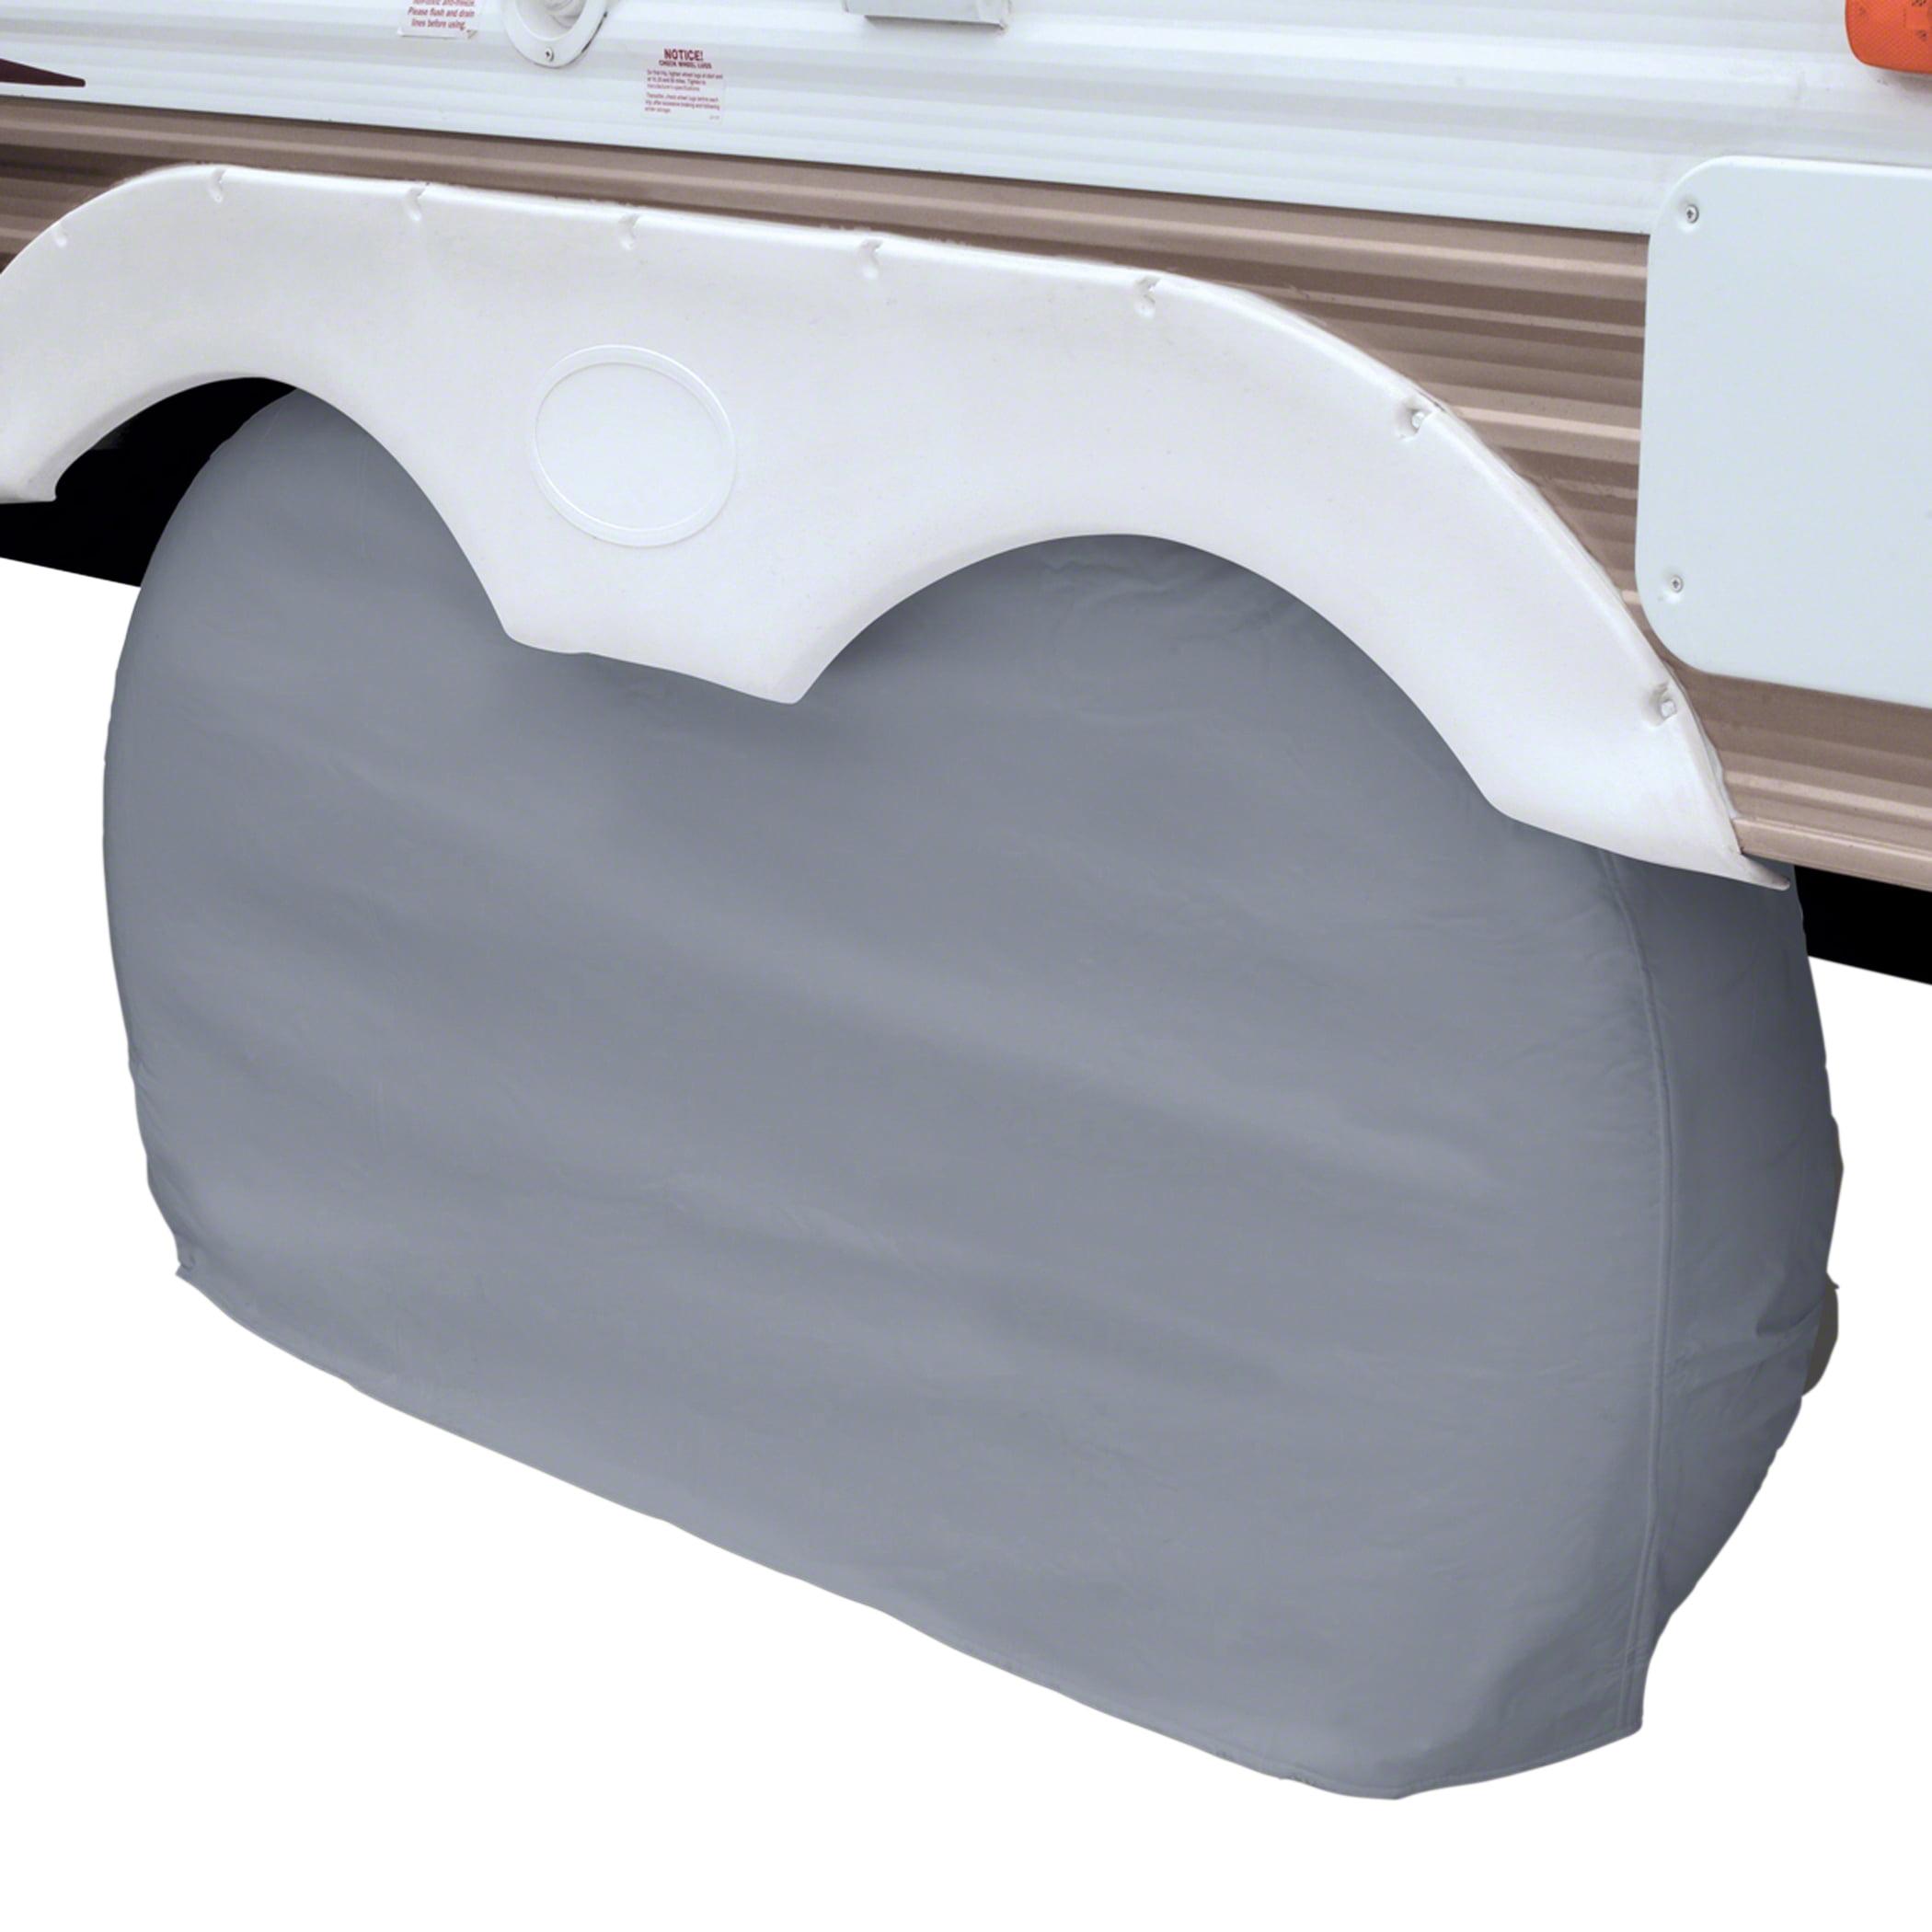 "Classic Accessories OverDrive Dual Axle Wheel RV Cover, Fits 30"" - 33"" Wheel Diameter, Grey"